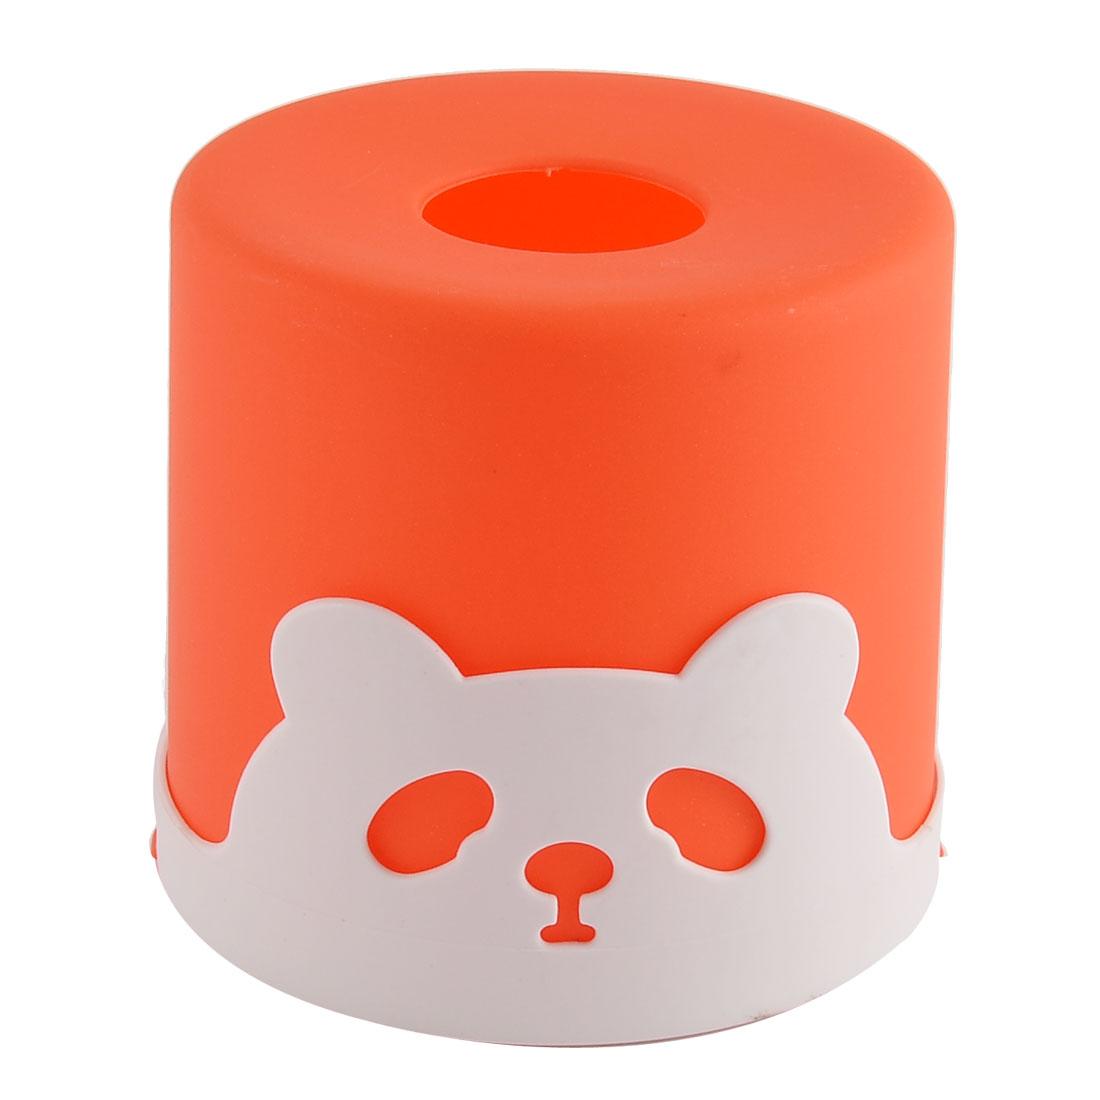 Household Car Plastic Round Panda Pattern Napkin Roll Tissue Paper Box Case Holder Cover Orange